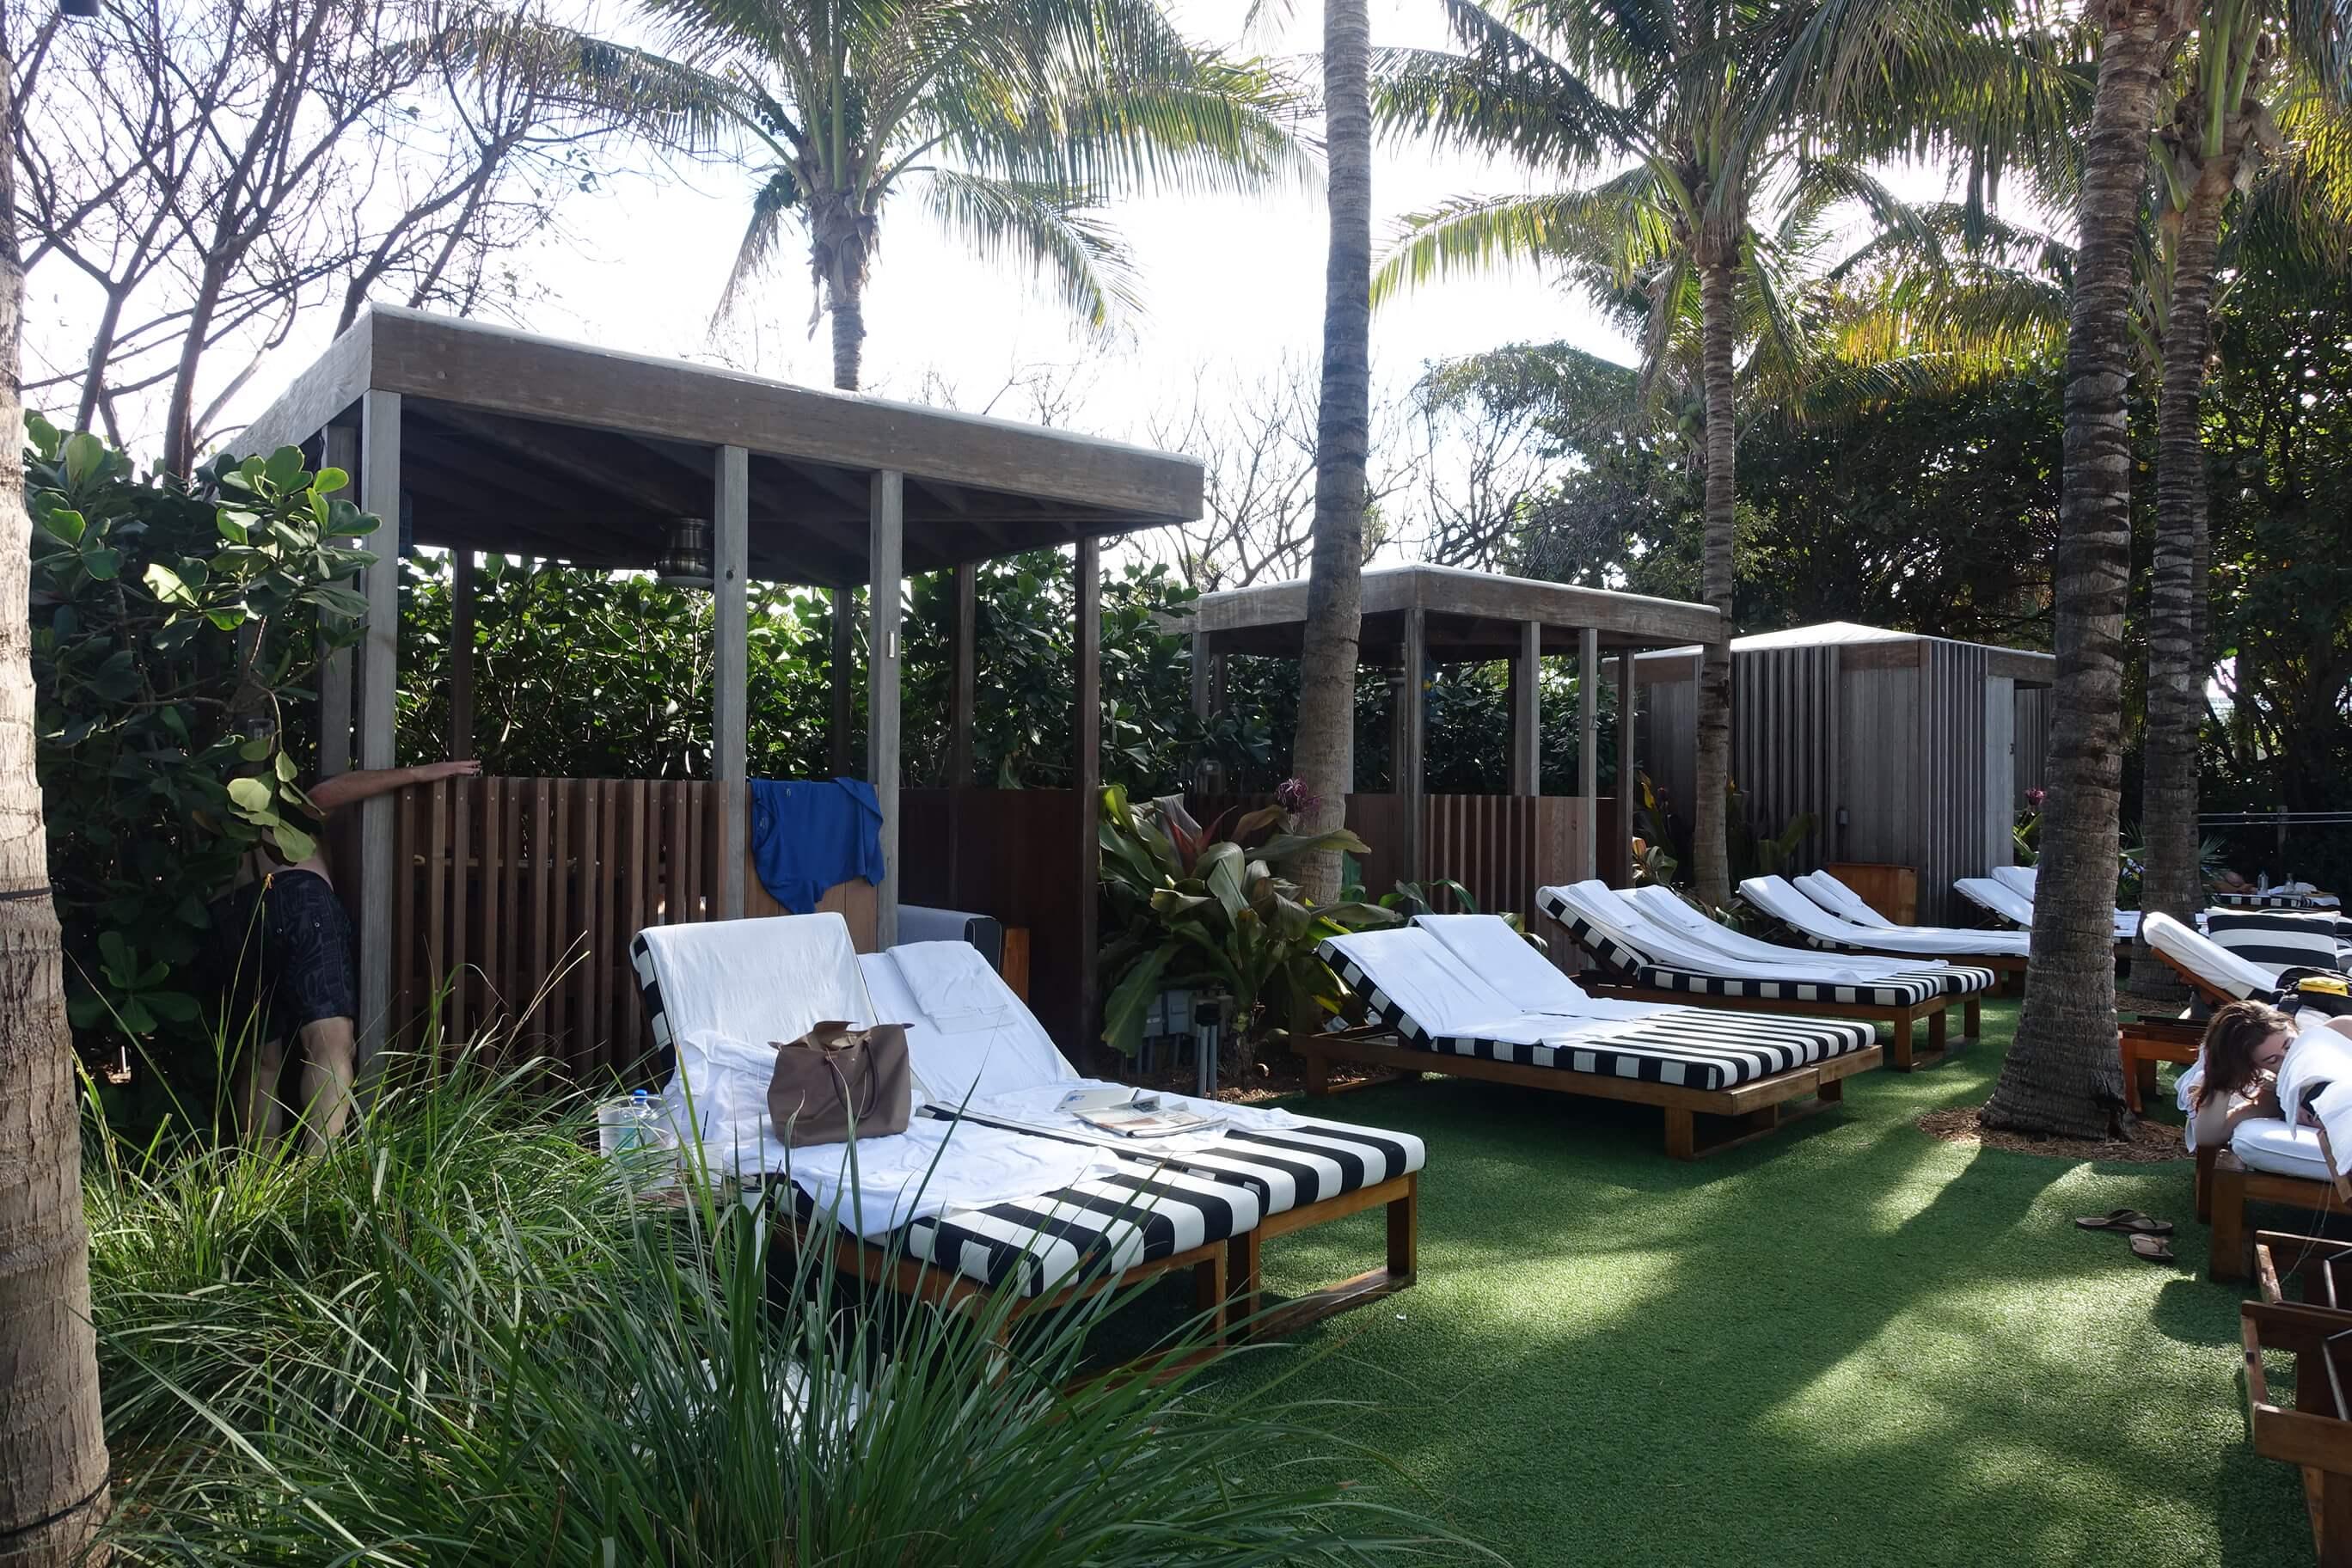 guide hotels gardens deals top vicinity garden cheap hotel desktopretina and in london c miami travel